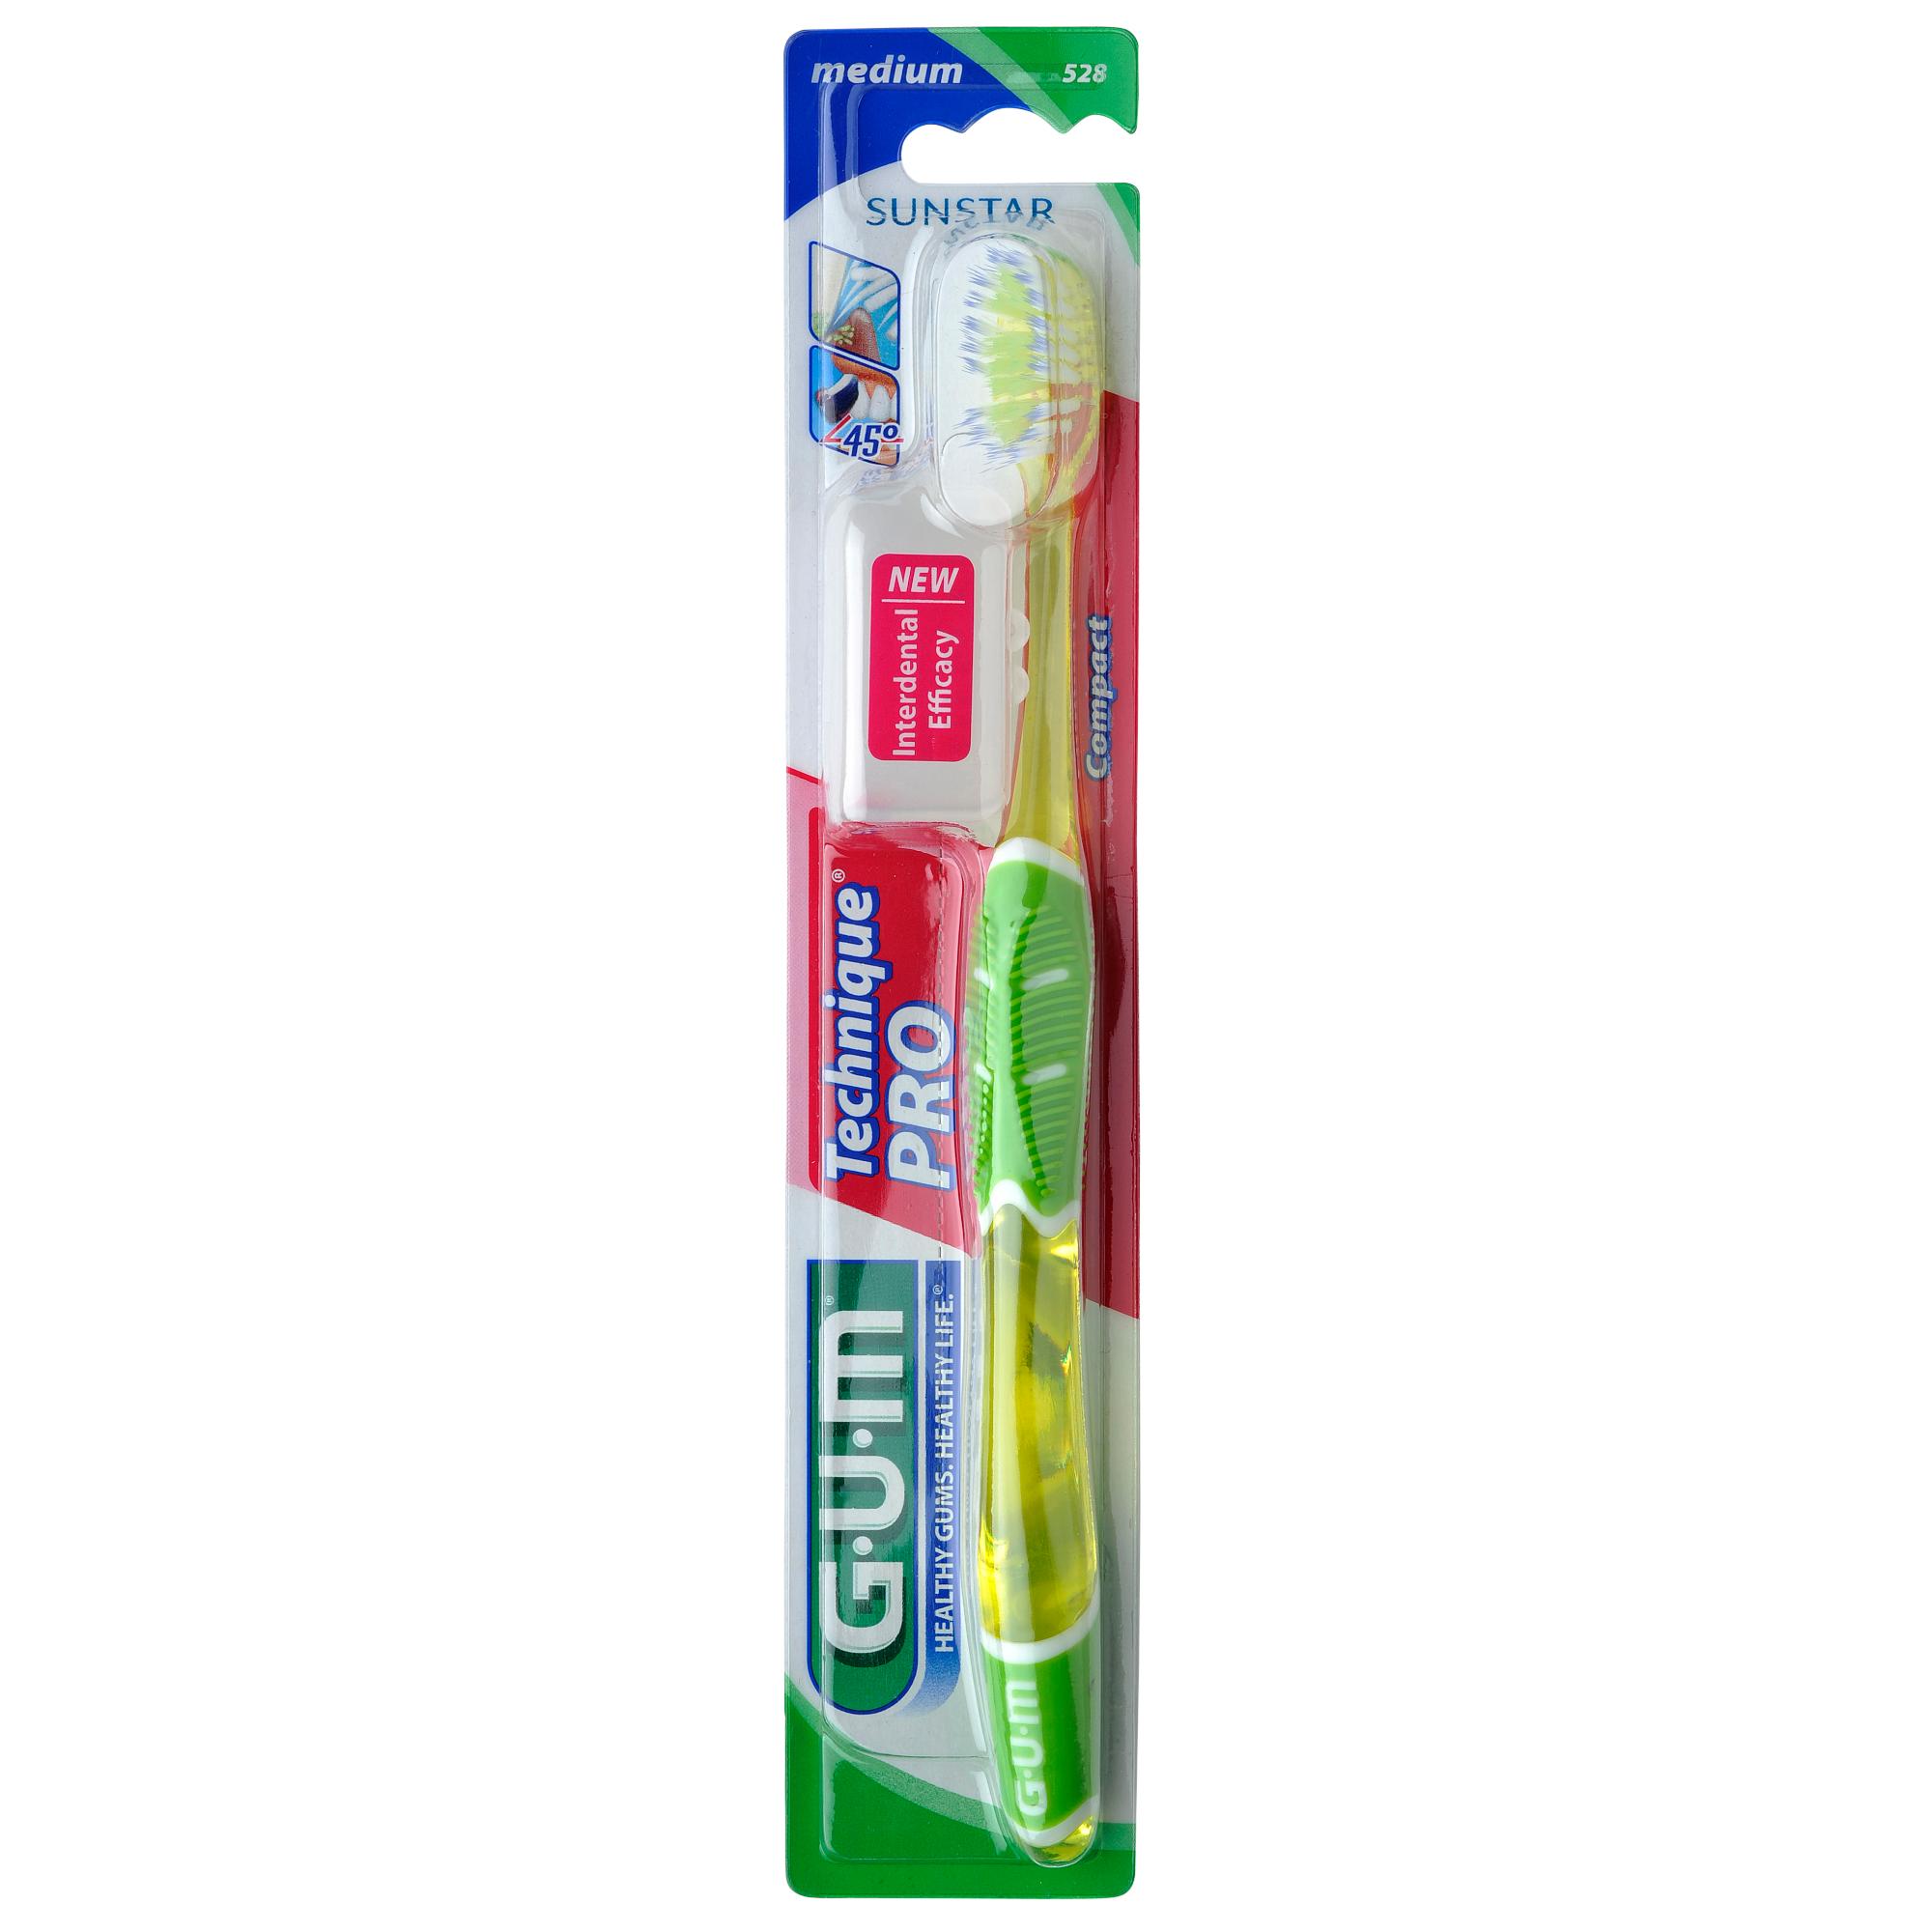 Gum Technique PRO Compact Medium Οδοντόβουρτσα με Θήκη Προστασίας (528) – πράσινο